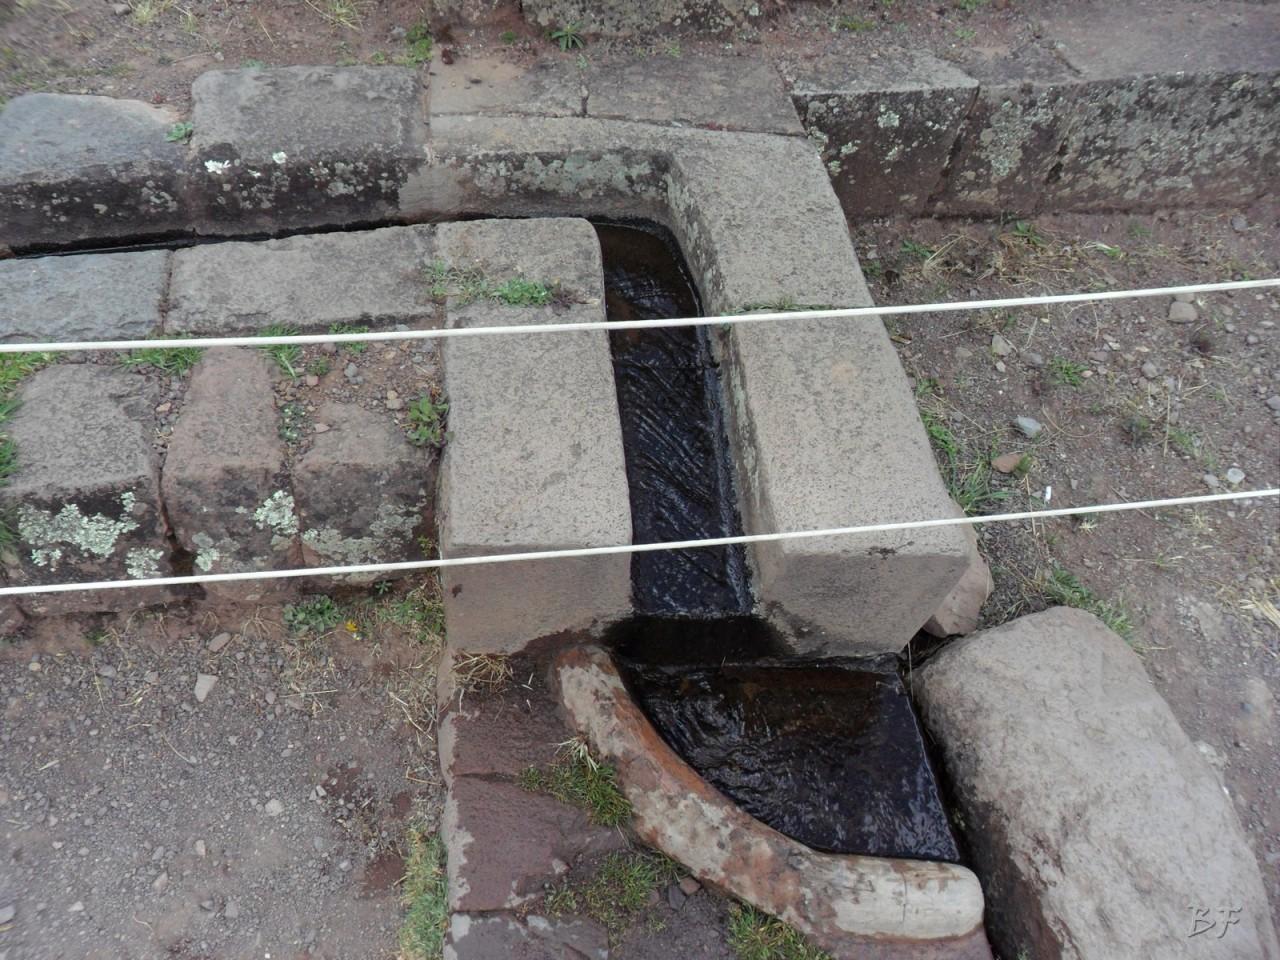 Mura-Poligonali-Megaliti-Altari-Rupestri-Pisac-Cusco-Perù-66